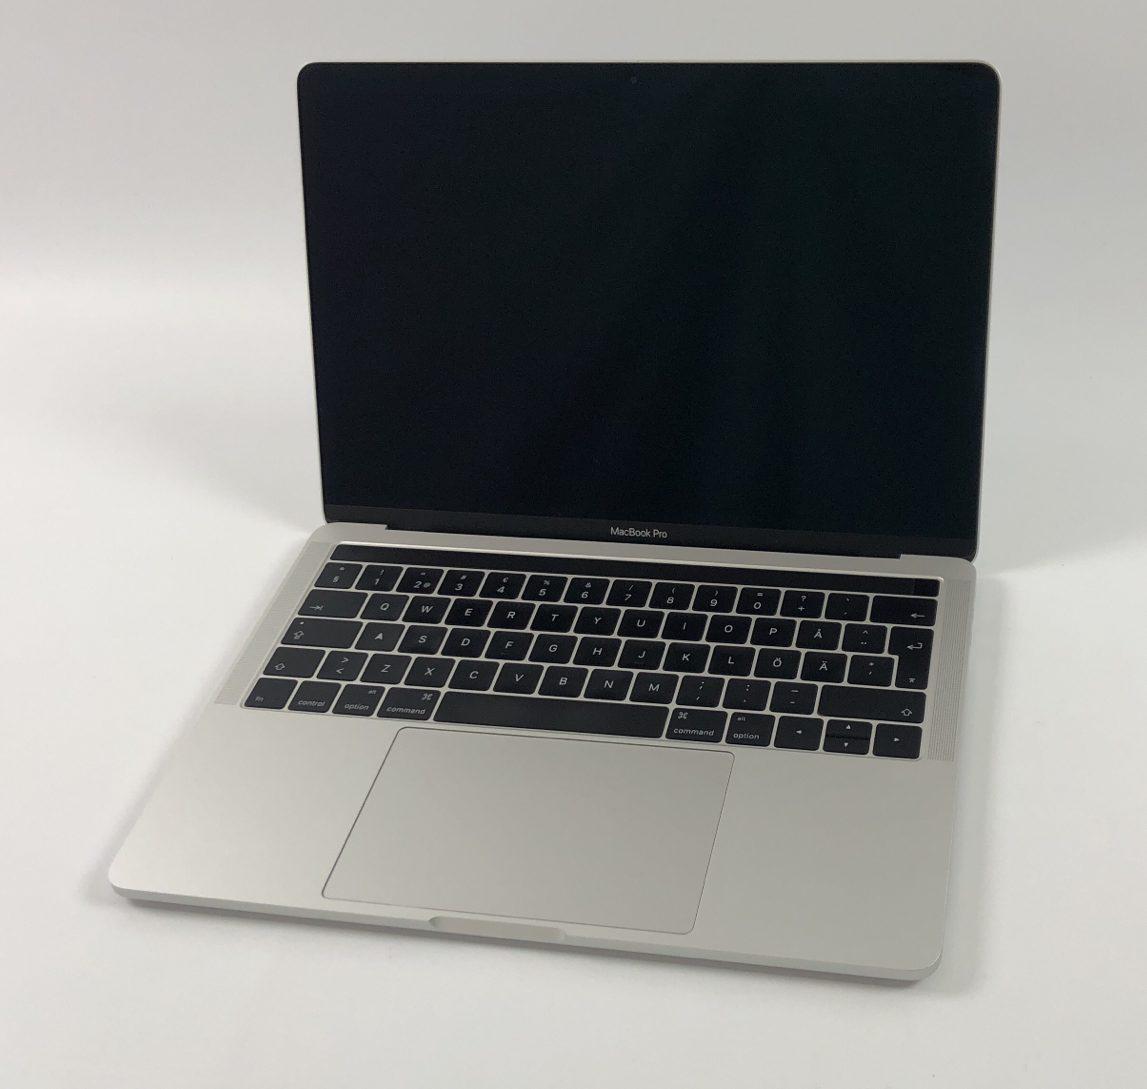 "MacBook Pro 13"" 4TBT Late 2016 (Intel Core i5 2.9 GHz 8 GB RAM 512 GB SSD), Silver, Intel Core i5 2.9 GHz, 8 GB RAM, 512 GB SSD, Kuva 1"